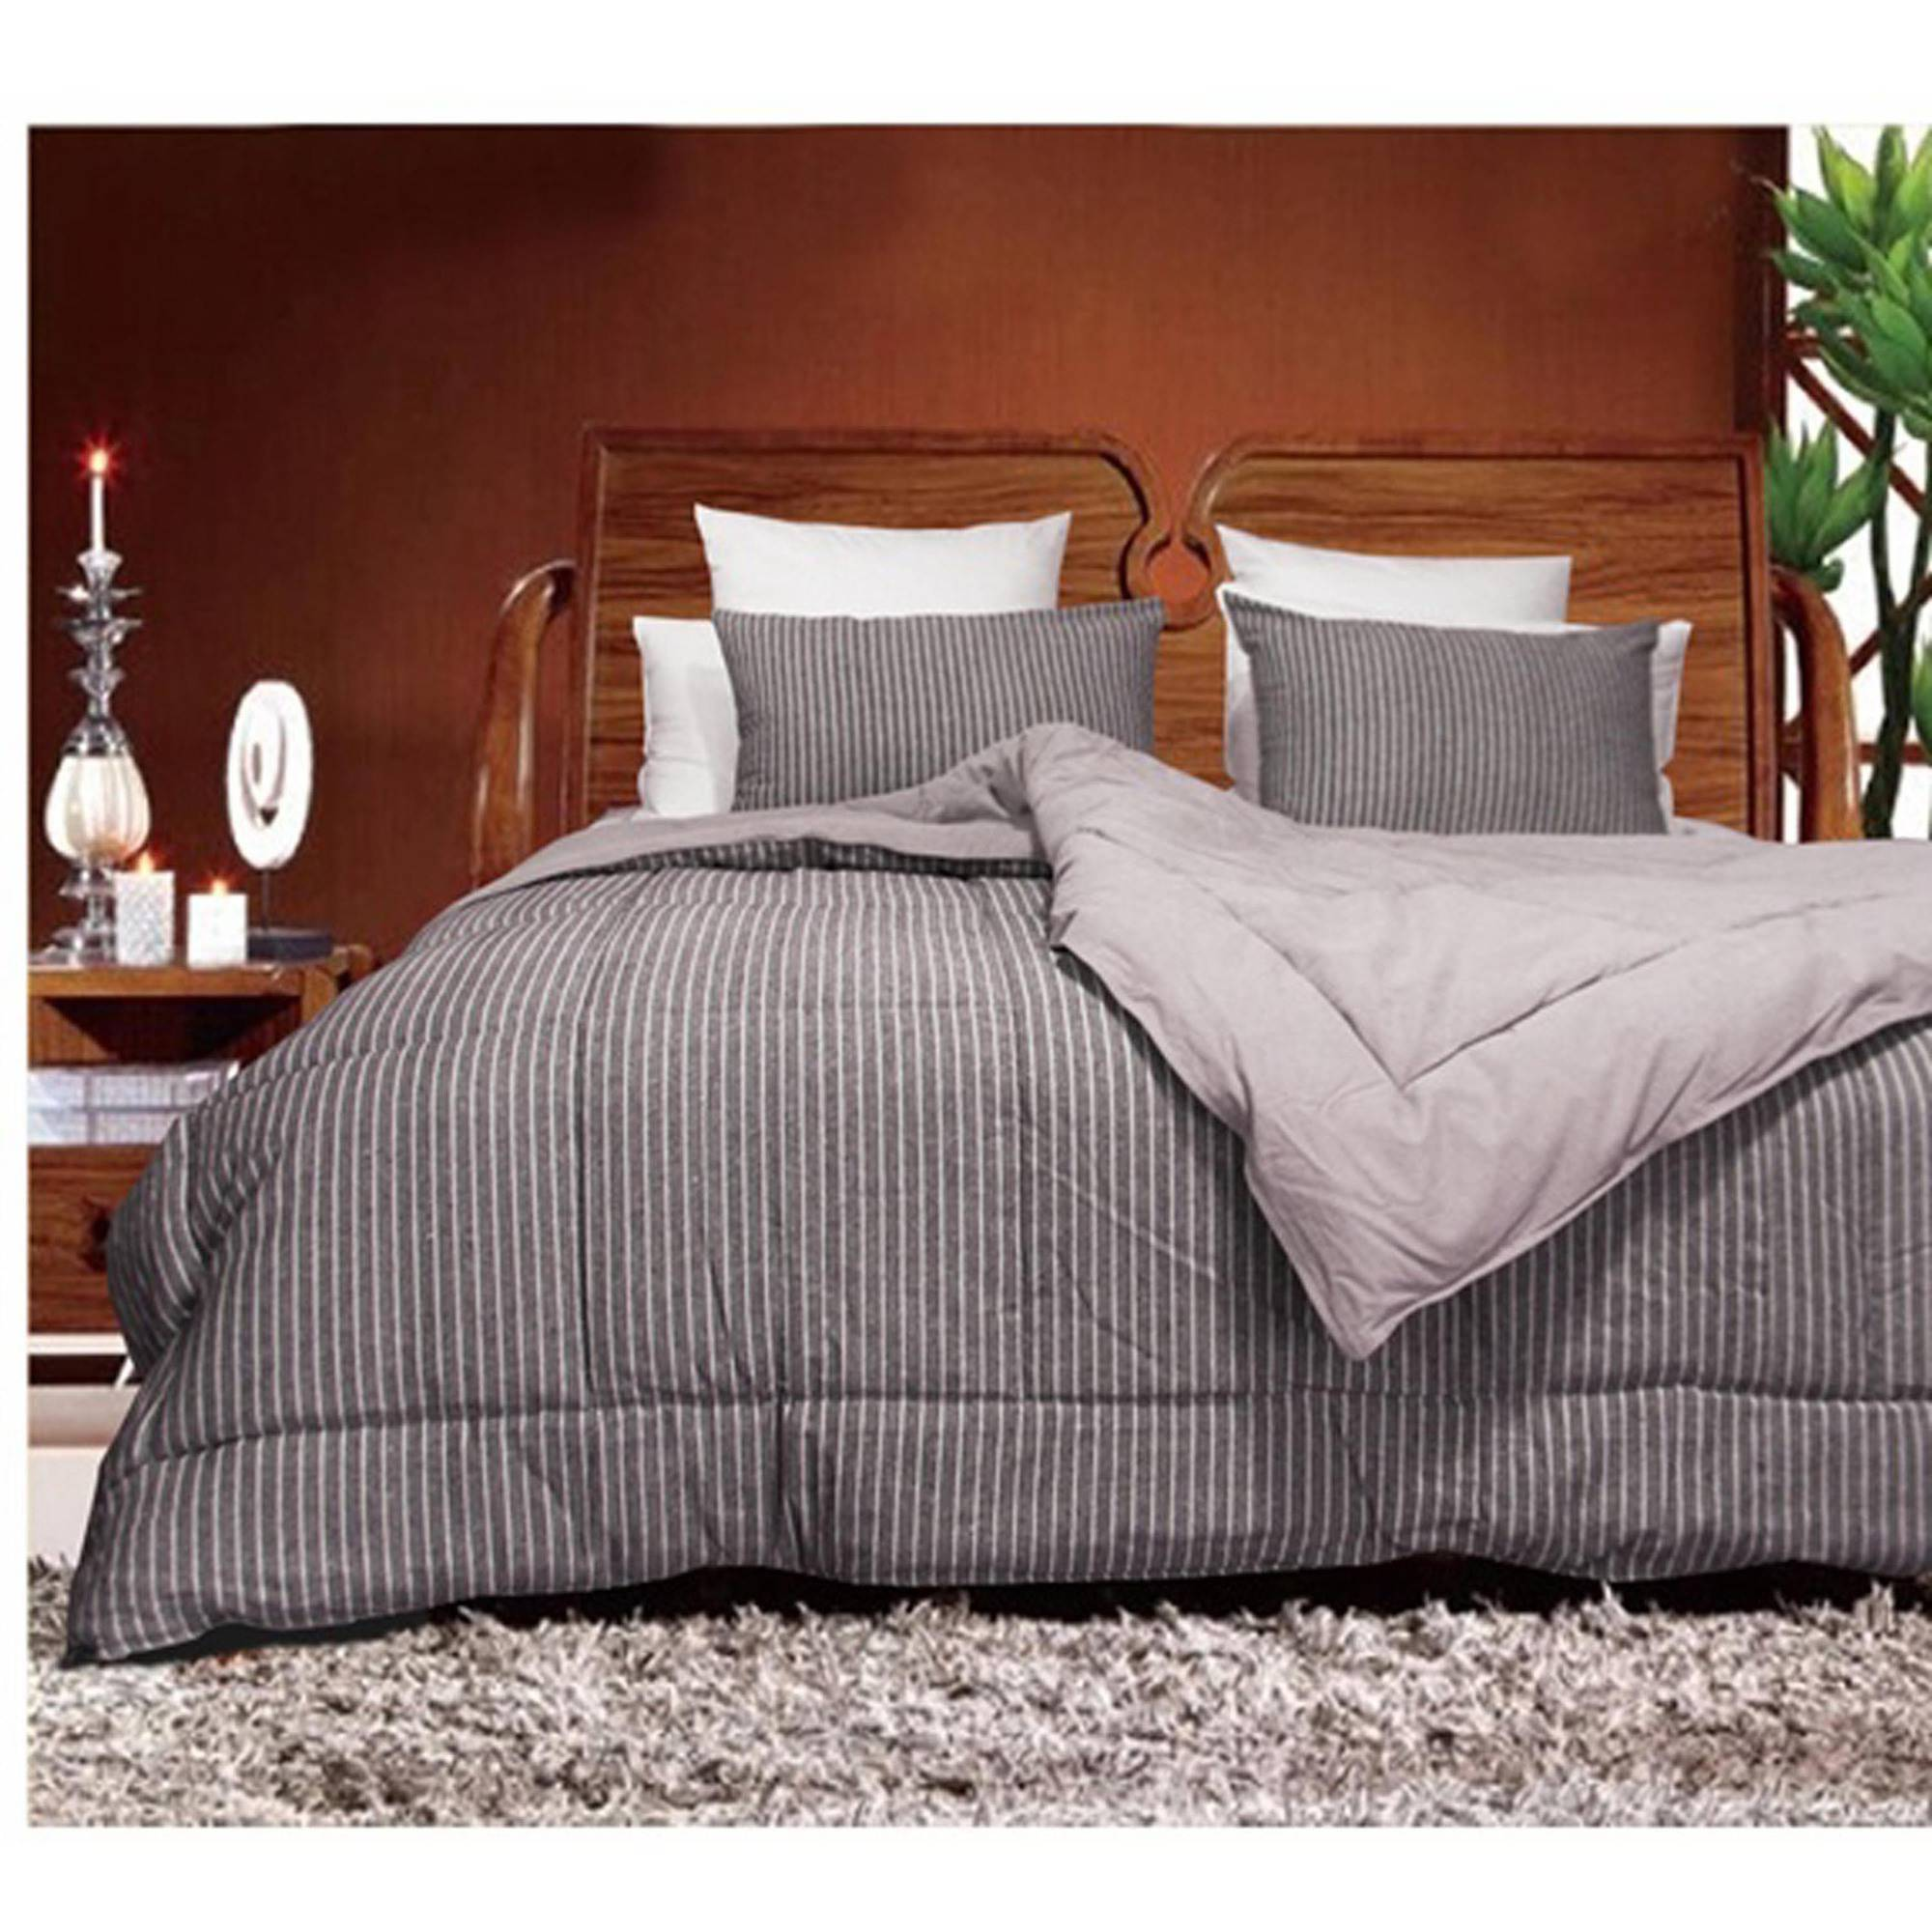 Luxury Natural Linen/Cotton Blended Washable Woven Stripe Comforter Mini Set